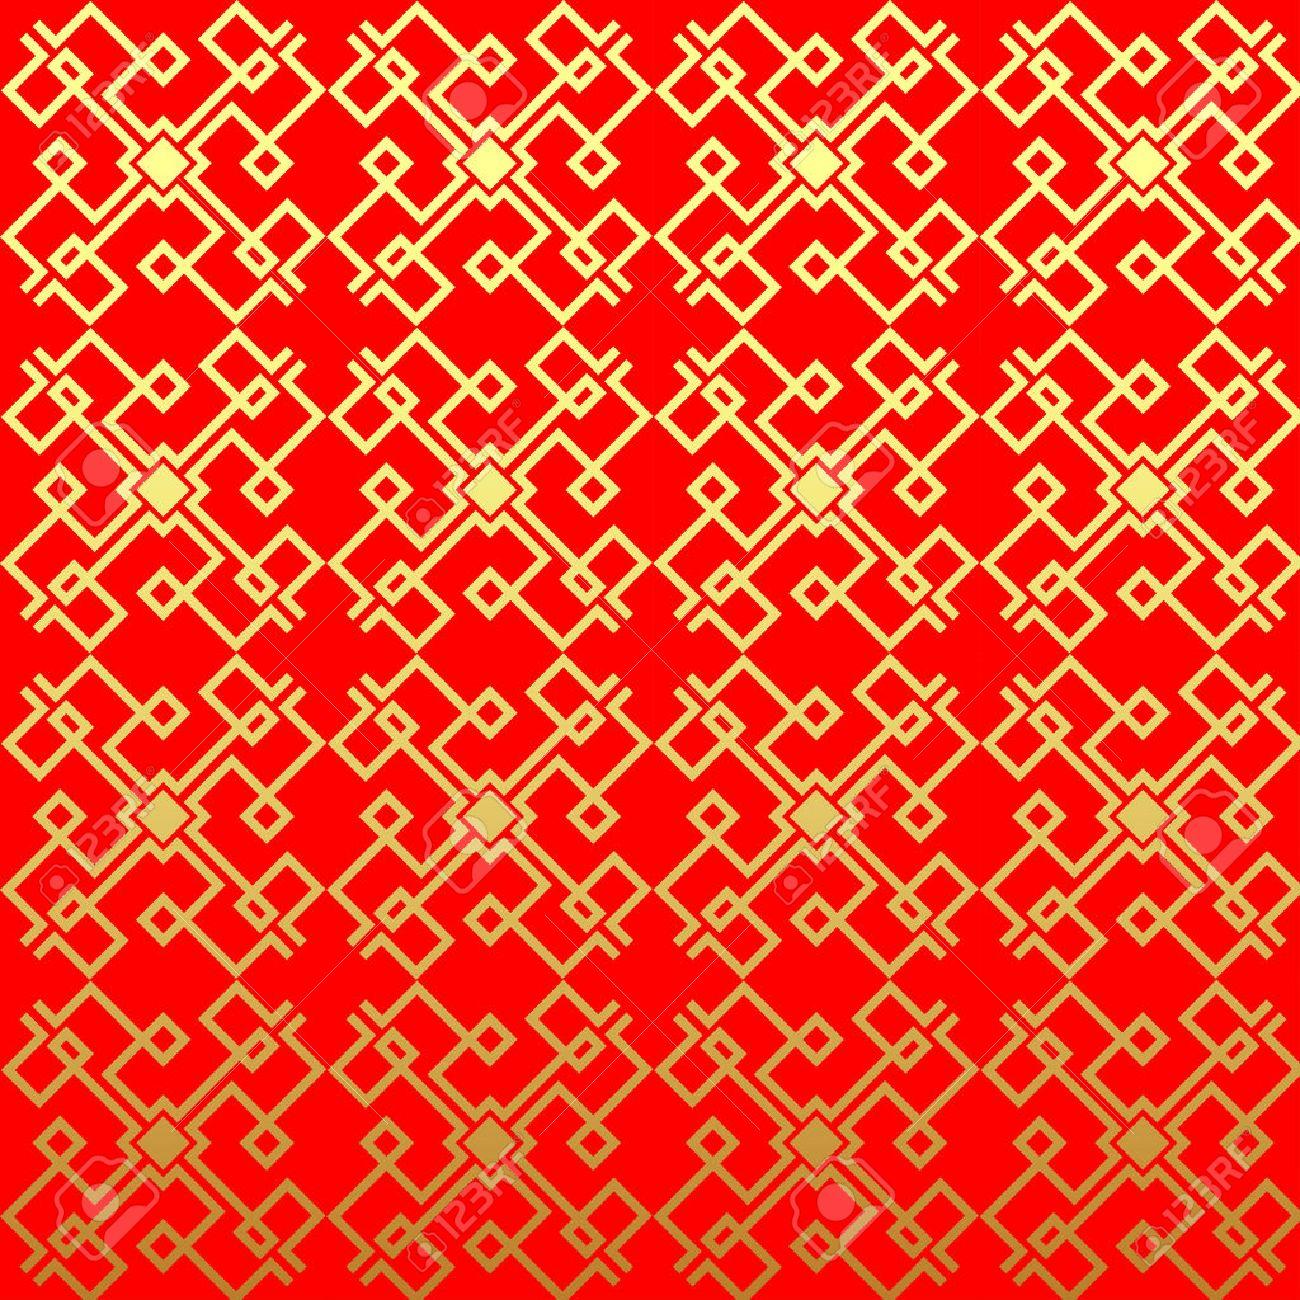 chinesische vektor nahtlose muster endlose textur kann fr tapeten muster fllt web - Tapeten Mit Muster